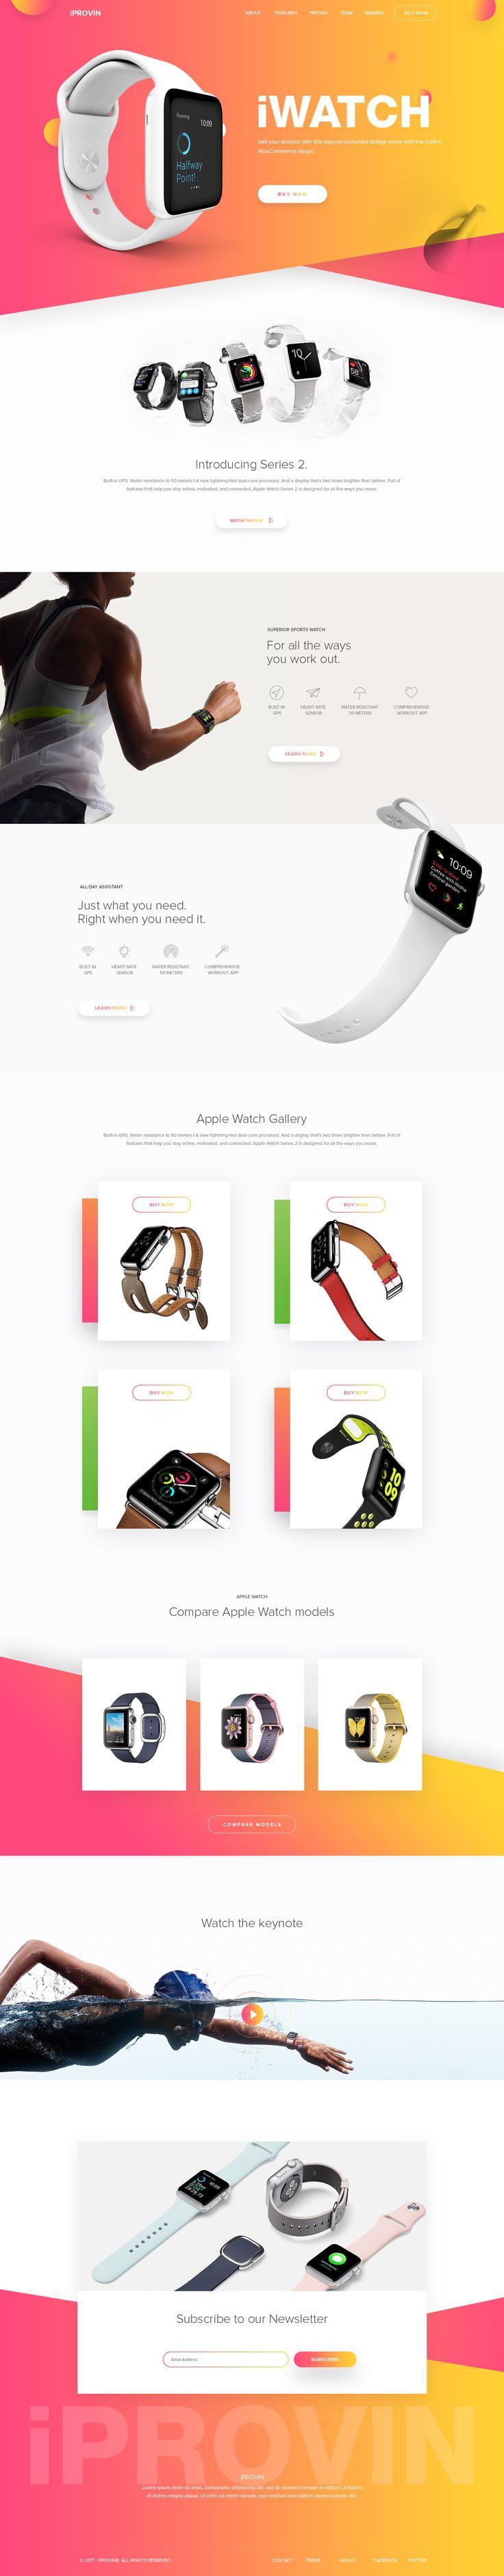 Iwatch landing page design